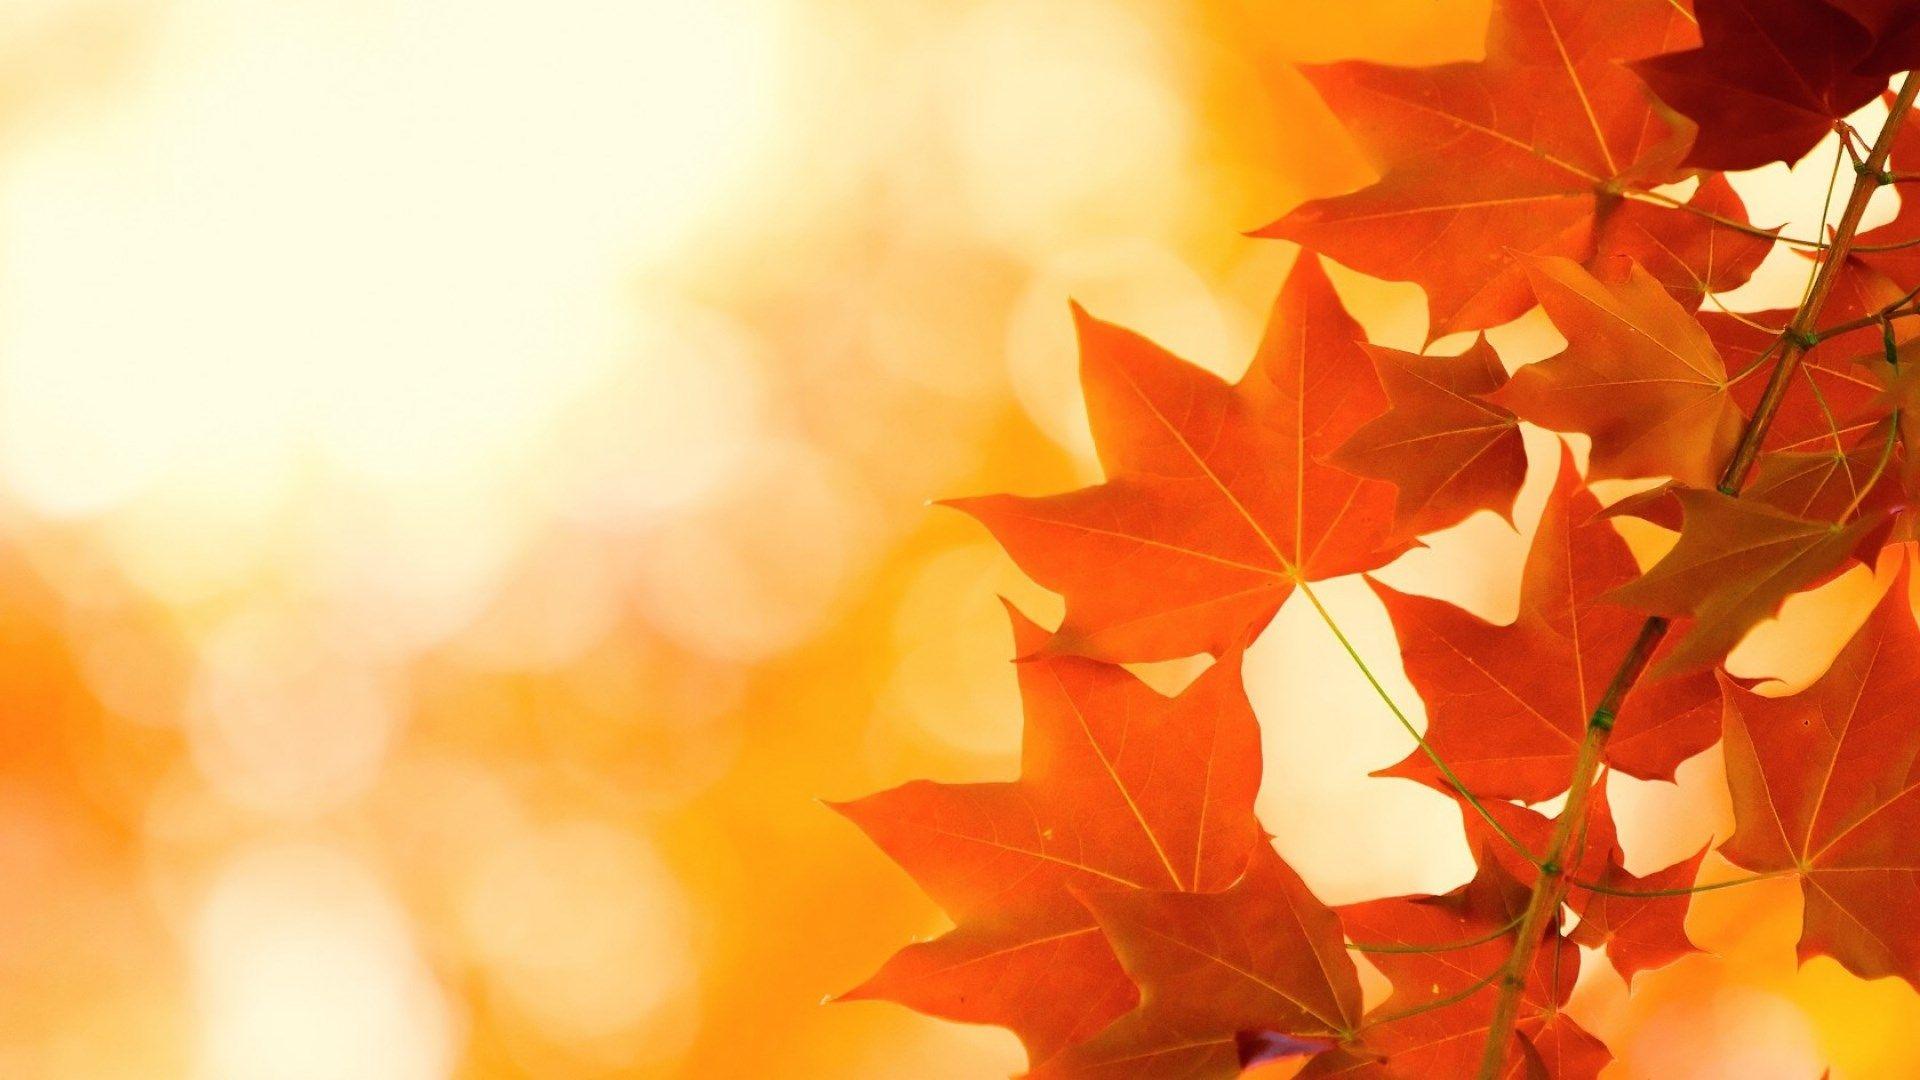 autumn free computer wallpaper